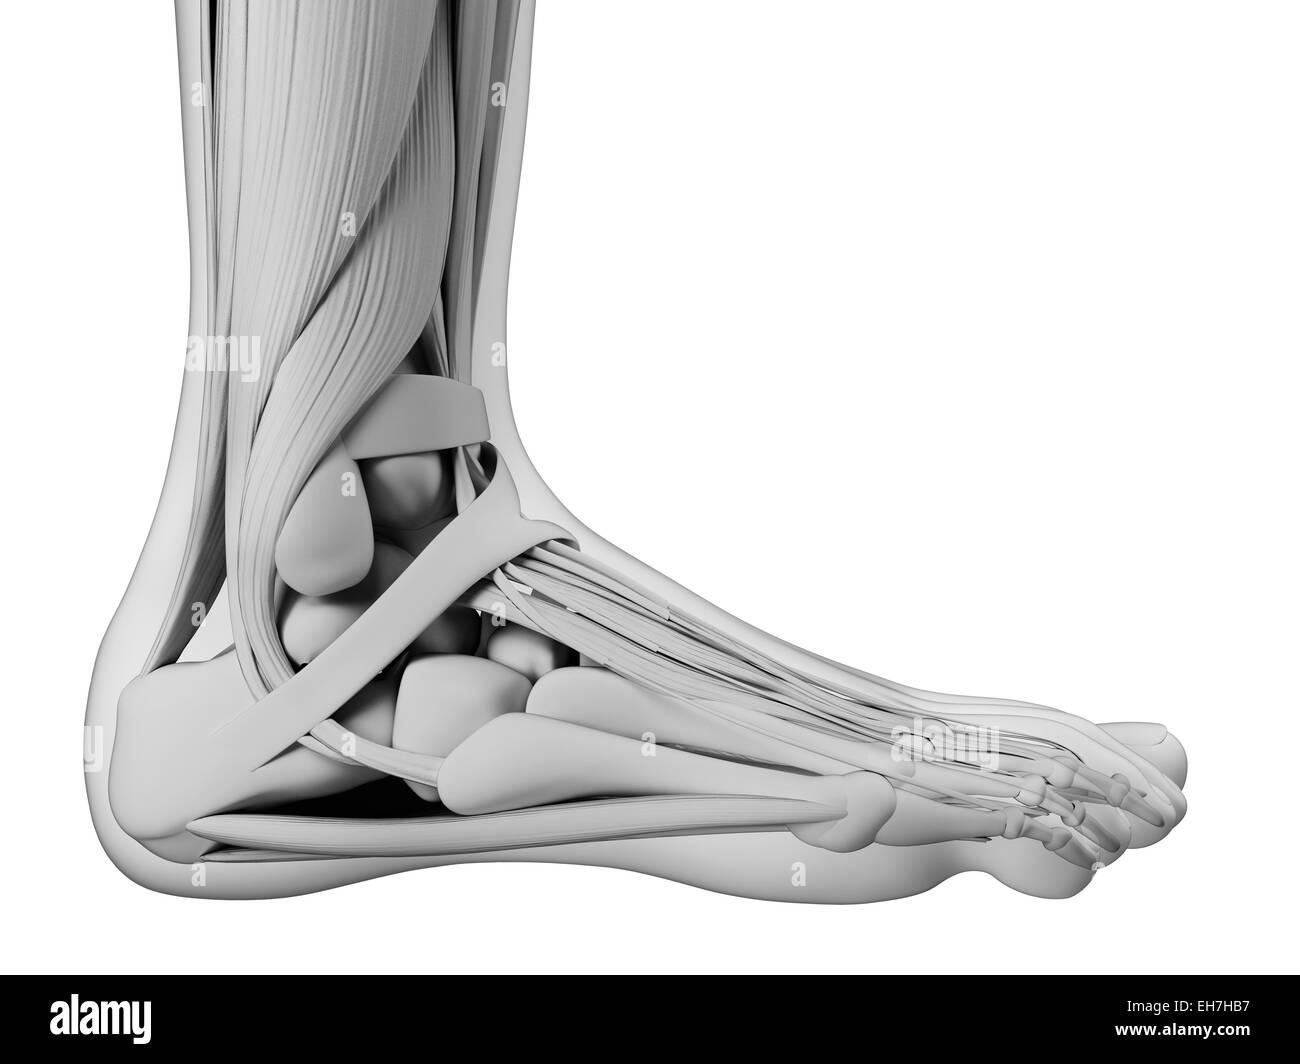 Human Foot Anatomy Computer Artwork Stockfotos & Human Foot Anatomy ...